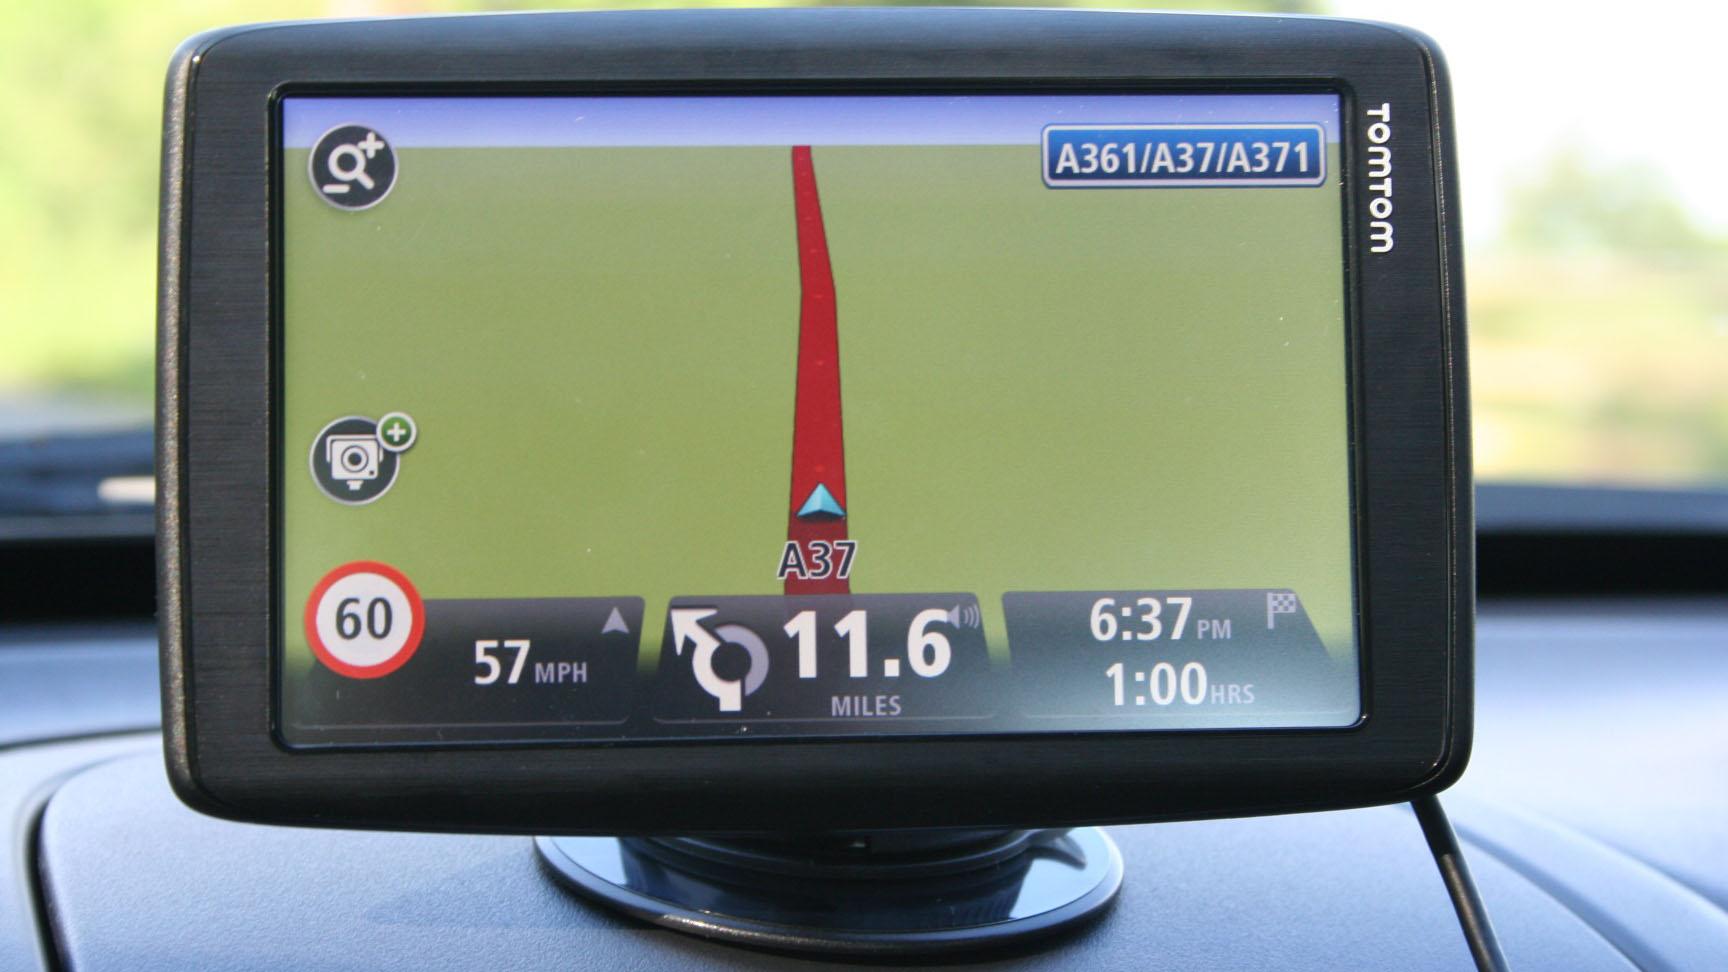 TomTom sat navs now reward you for good driving   TechRadar